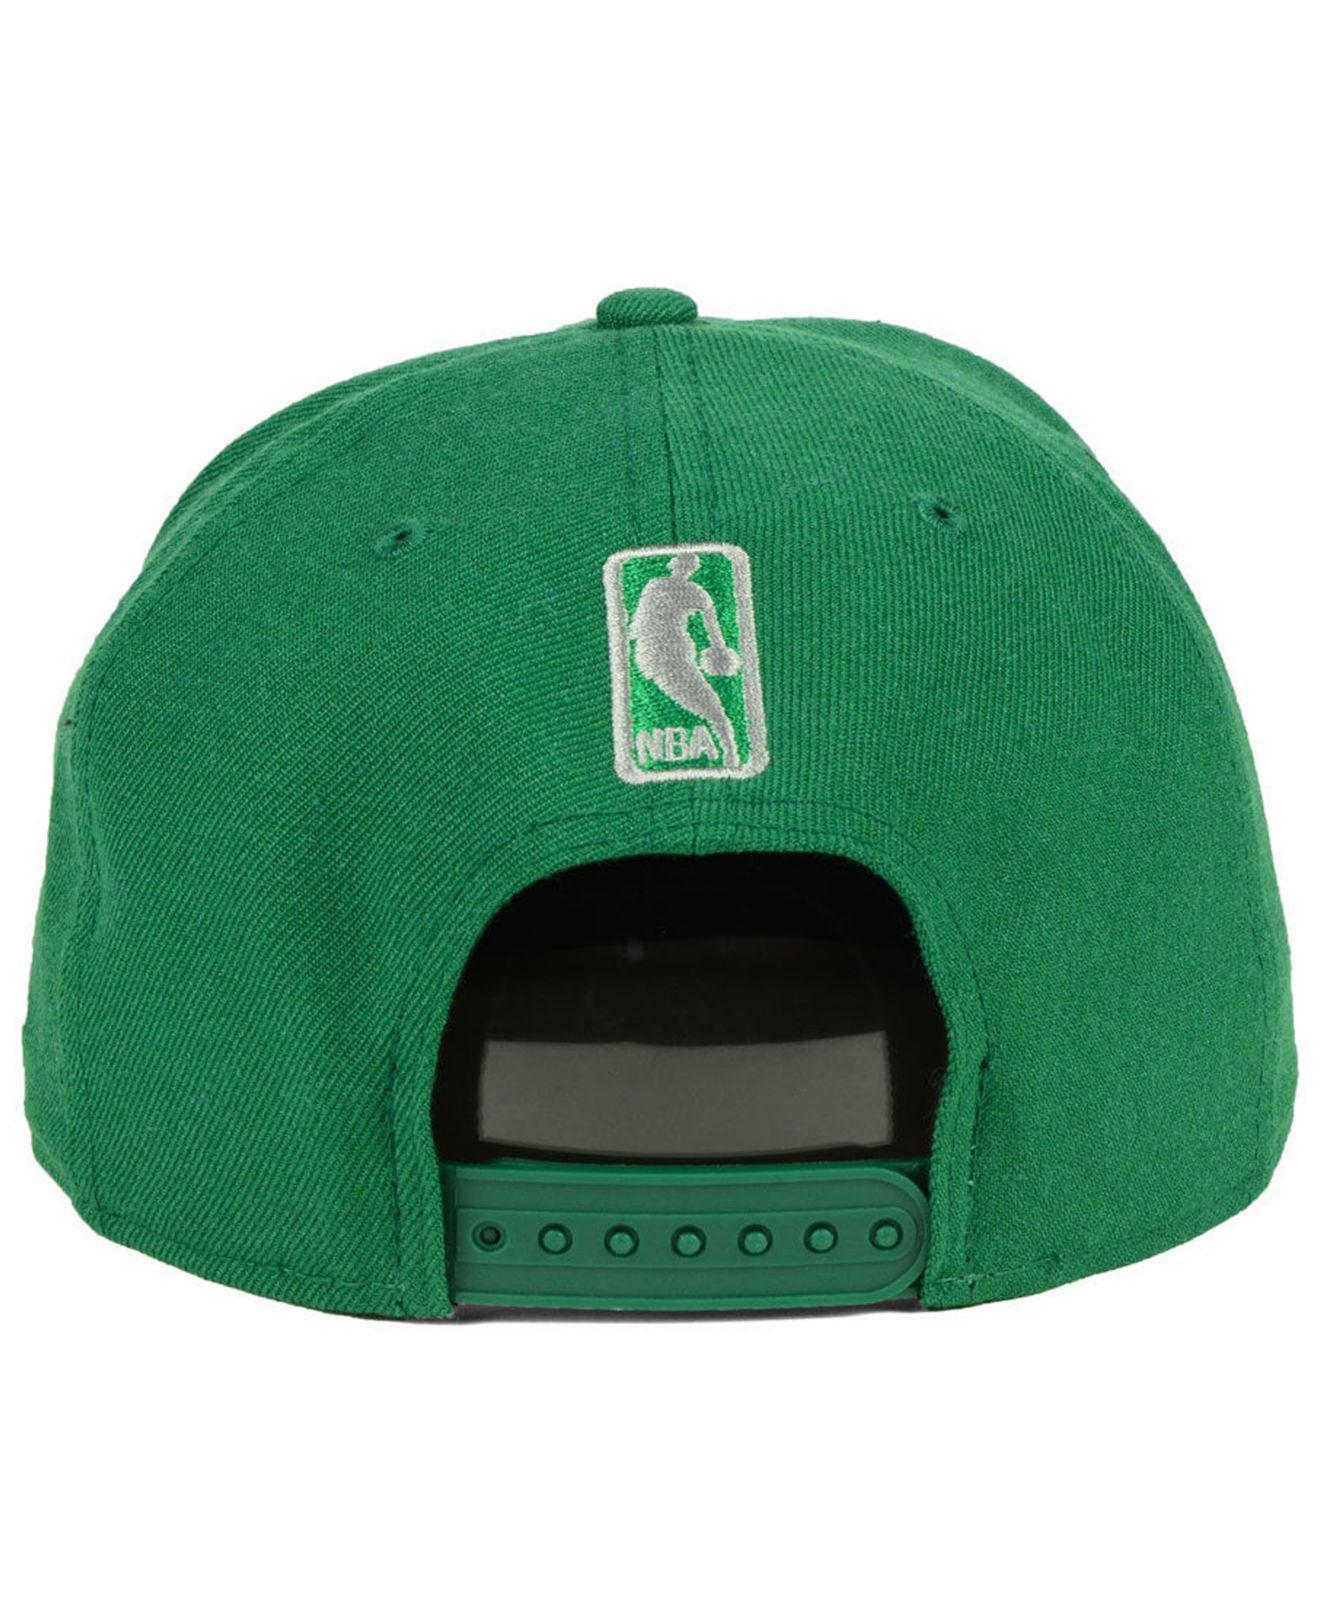 promo code 7bda9 58b59 closeout boston celtics retro triangle 9fifty snapback cap for men lyst. view  fullscreen 1fc22 767bc